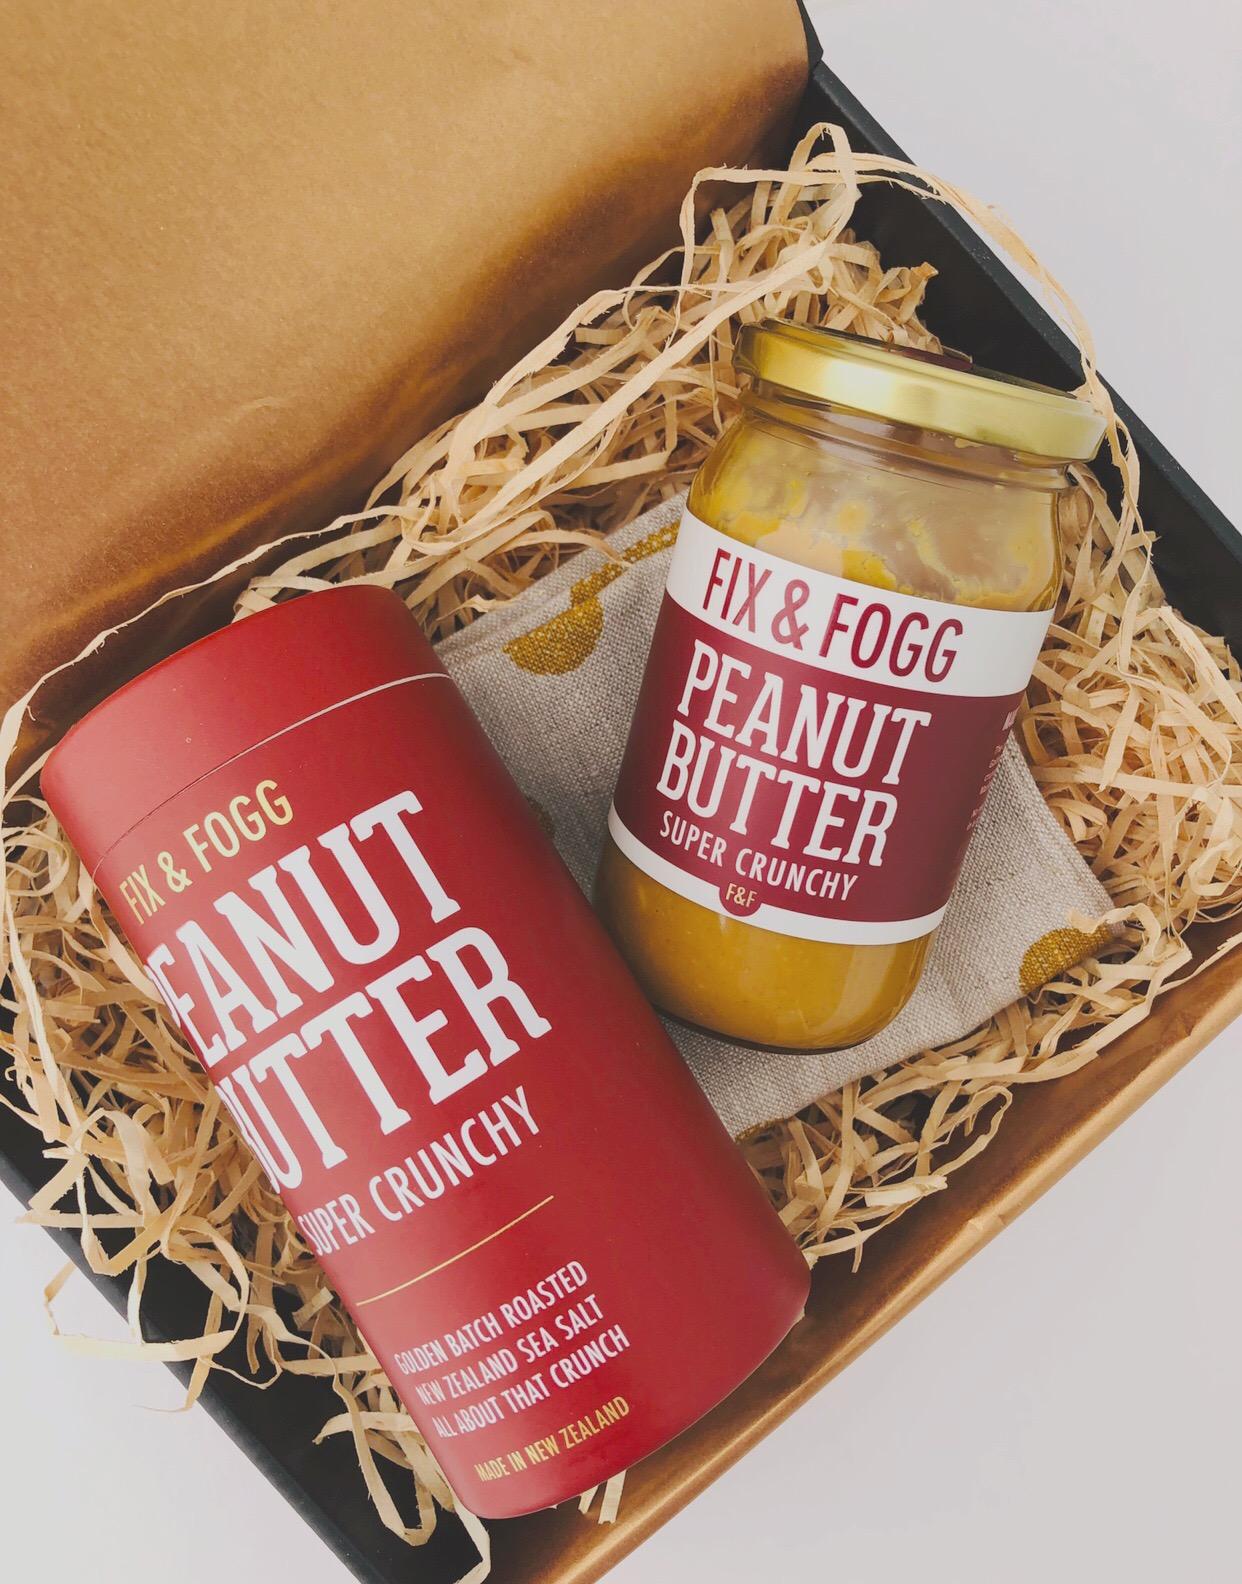 crunchy nut gift box